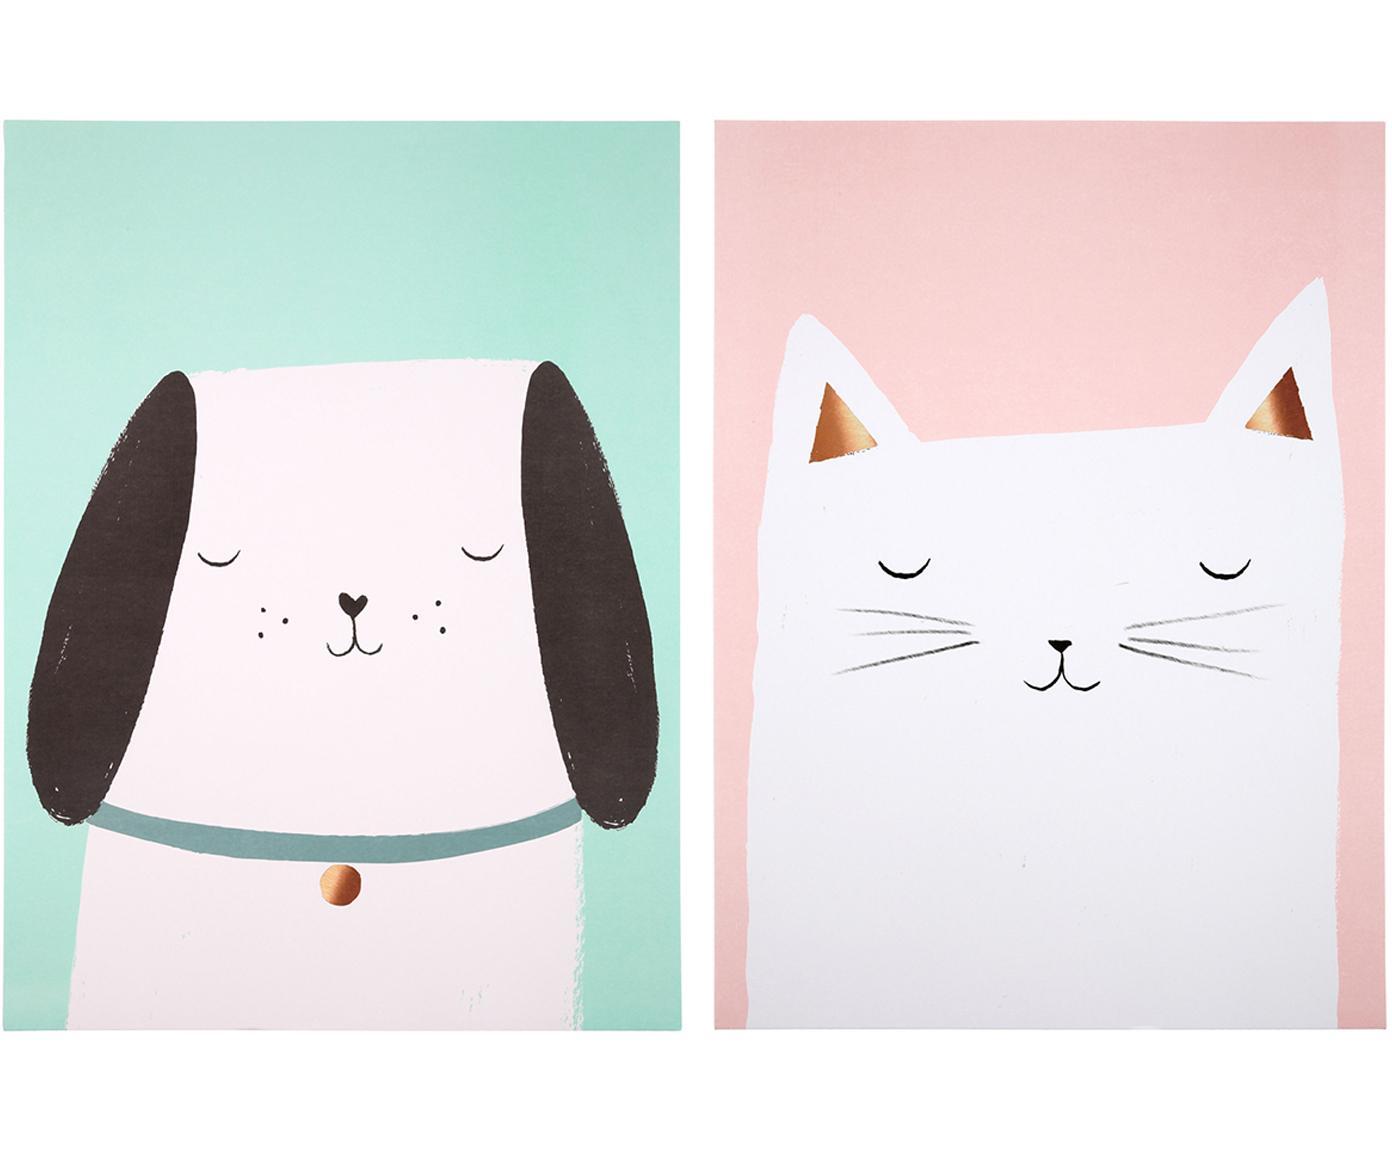 Set poster Cat & Dog, 2 pz., Stampa digitale su carta, 200 g/m², Rosa, verde, bianco, nero, Larg. 31 x Alt. 41 cm